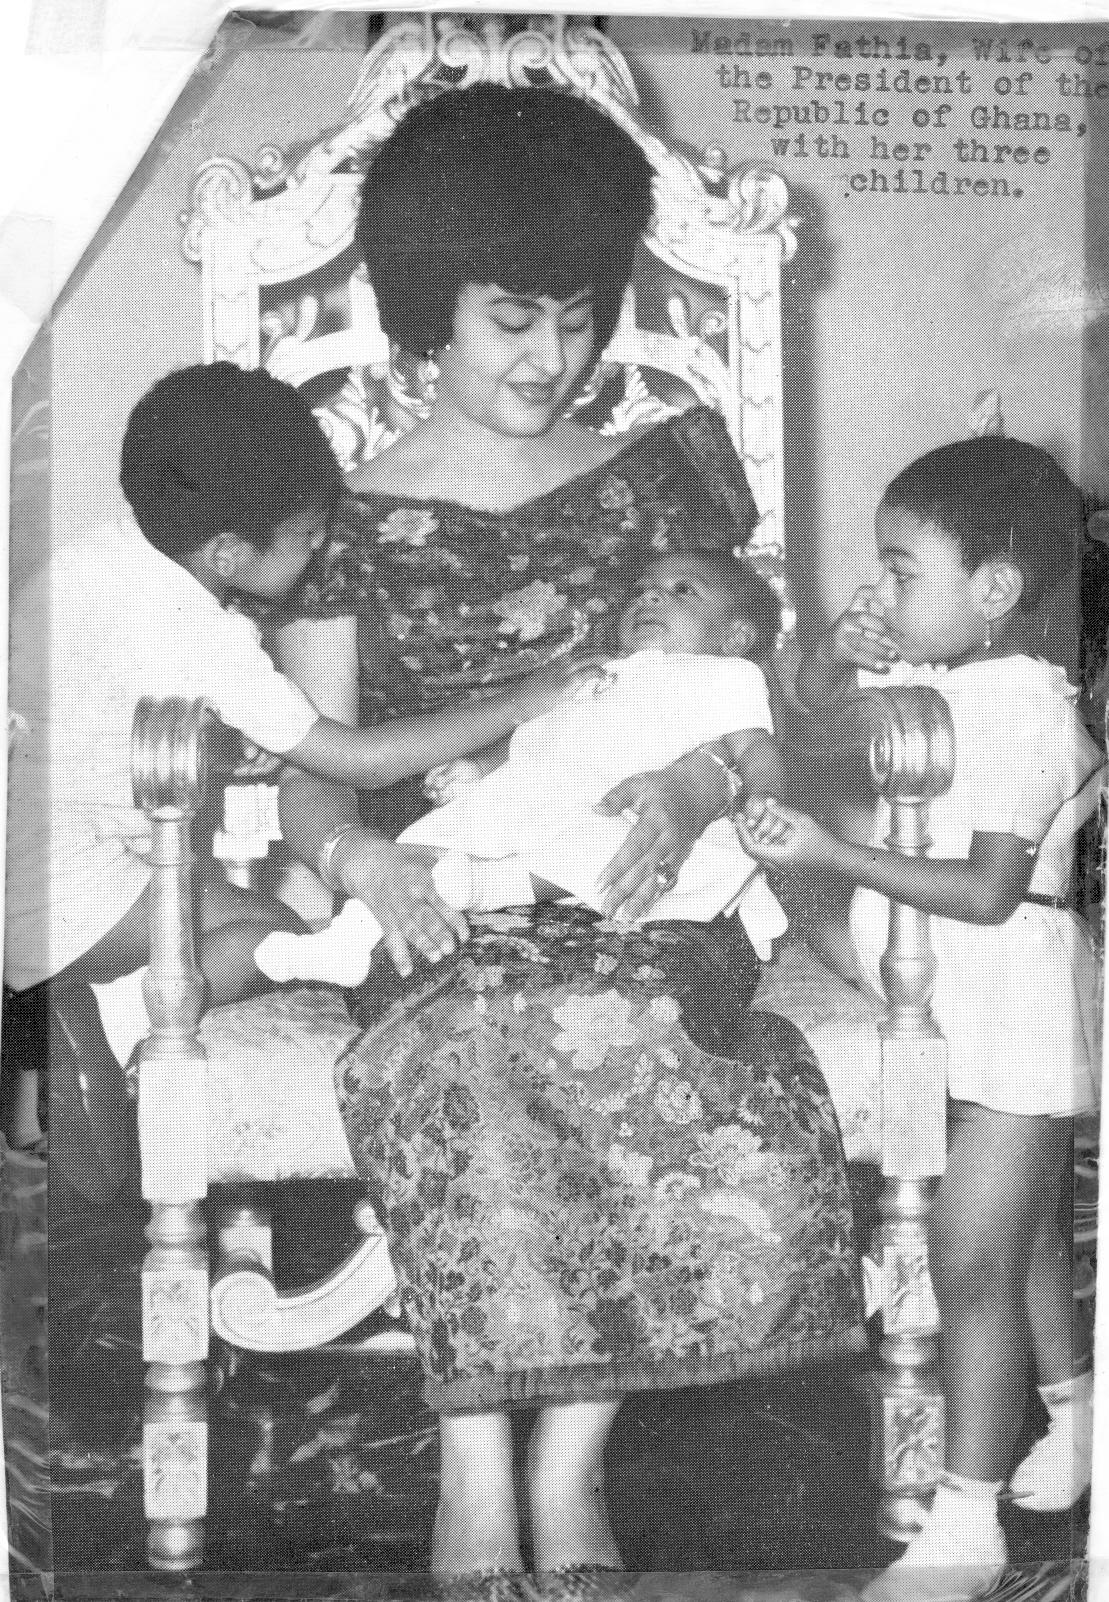 Fathia Nkrumah & children